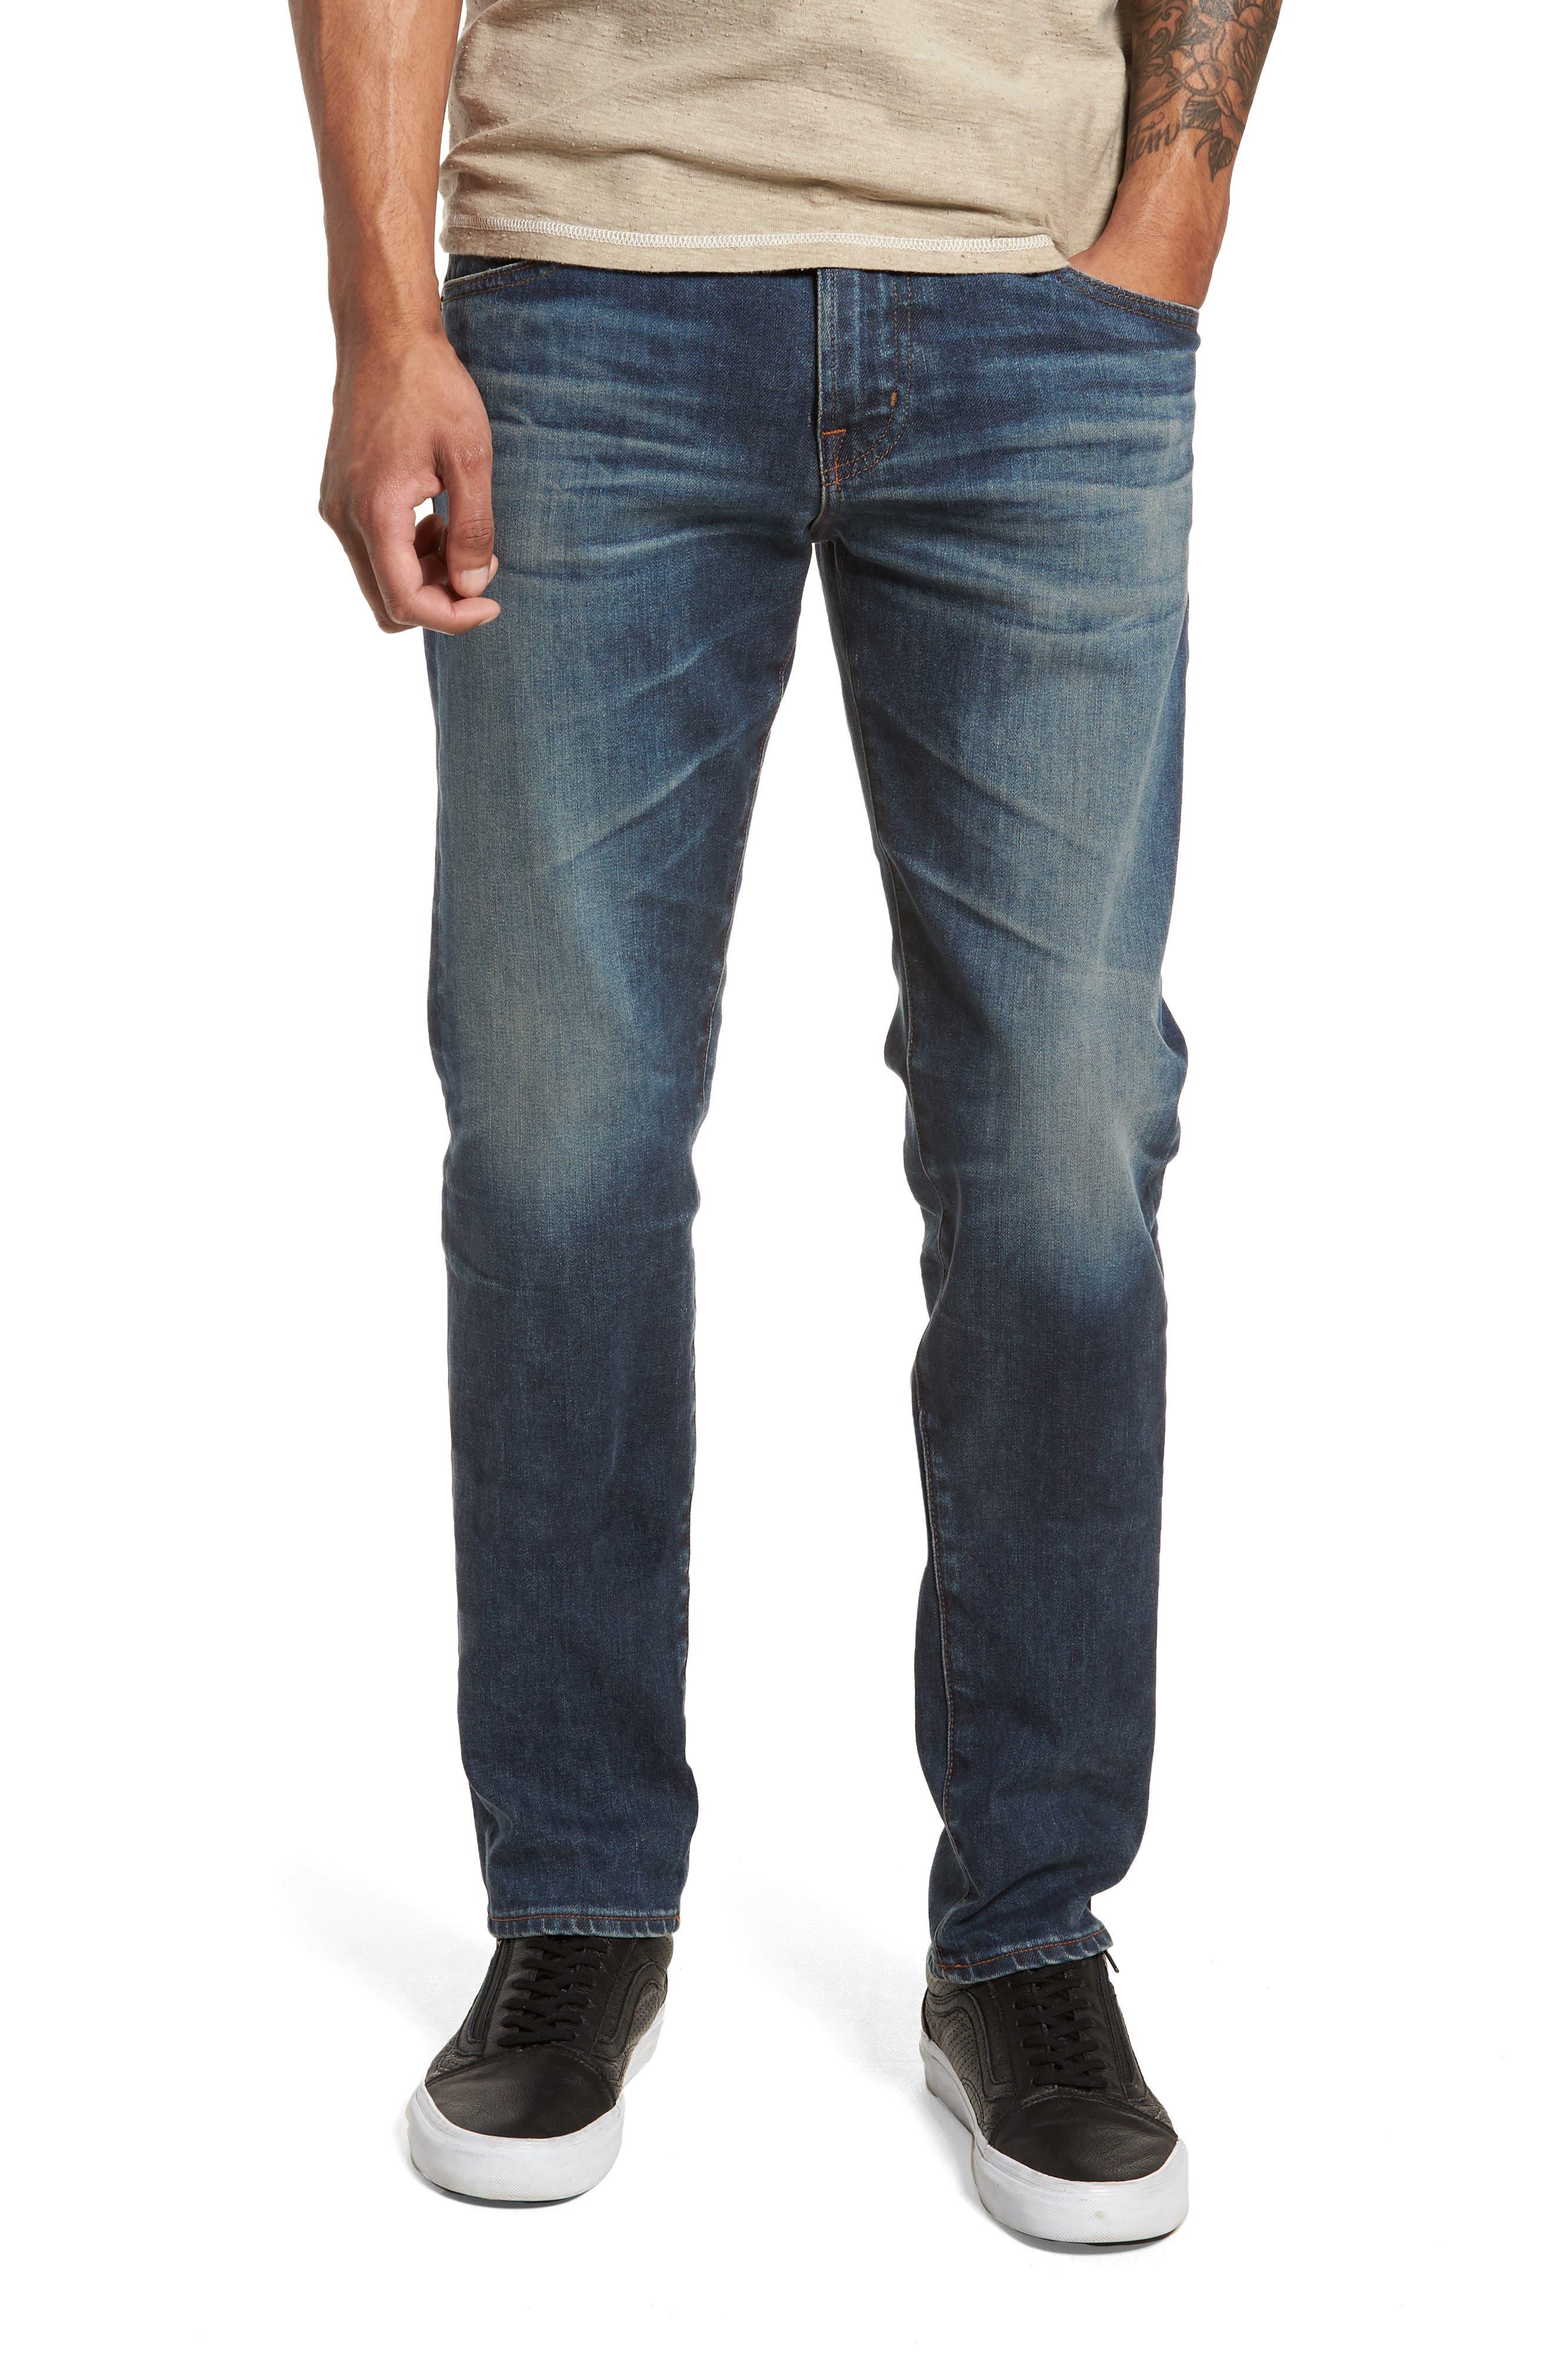 Dylan Slim Skinny Fit Jeans,                             Main thumbnail 1, color,                             12 Years River Veil